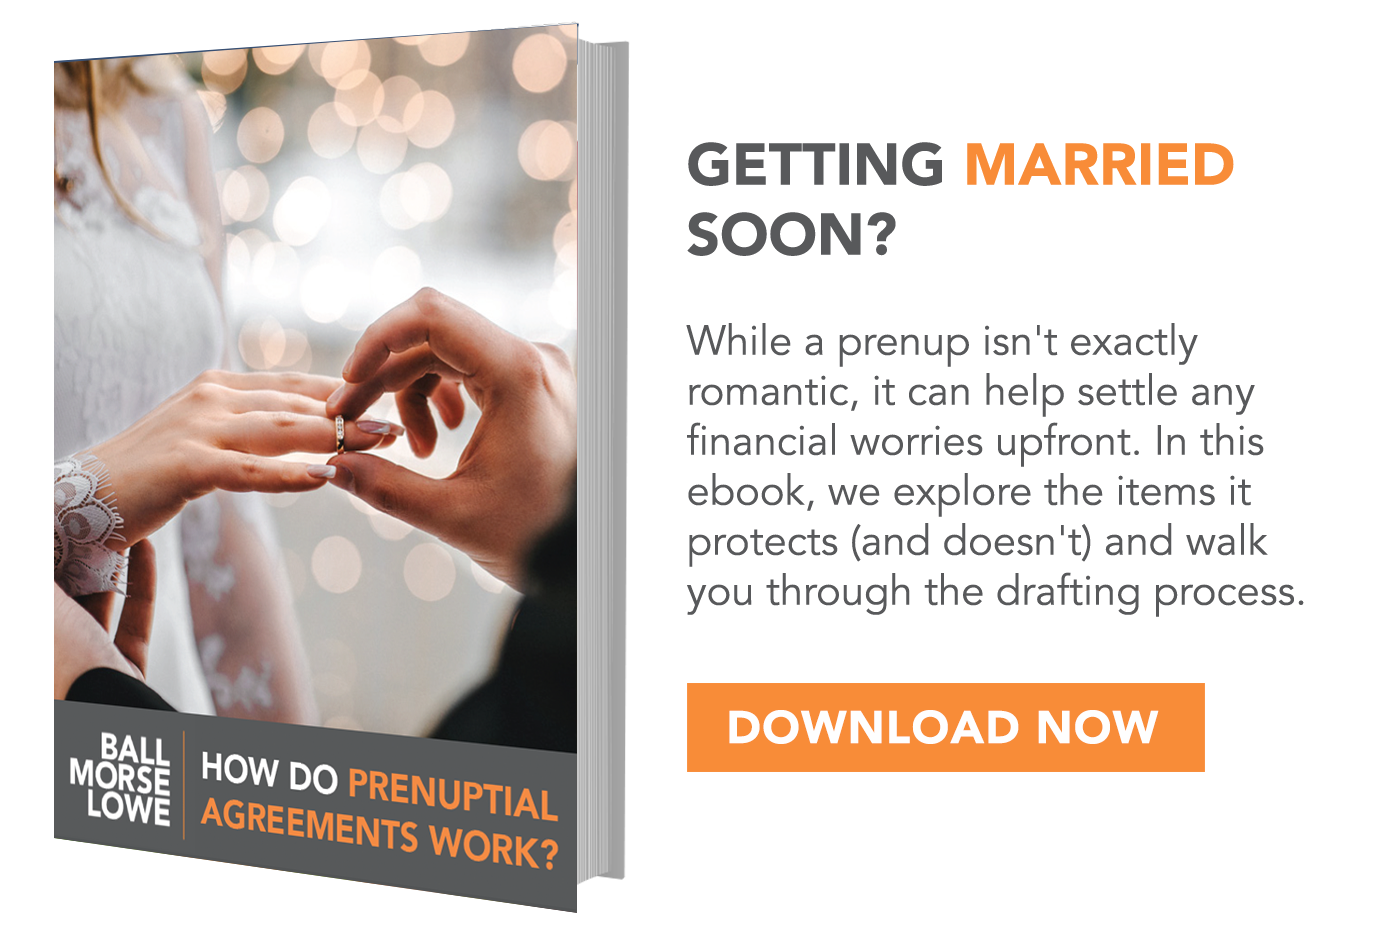 How Do Prenuptial Agreements Work?